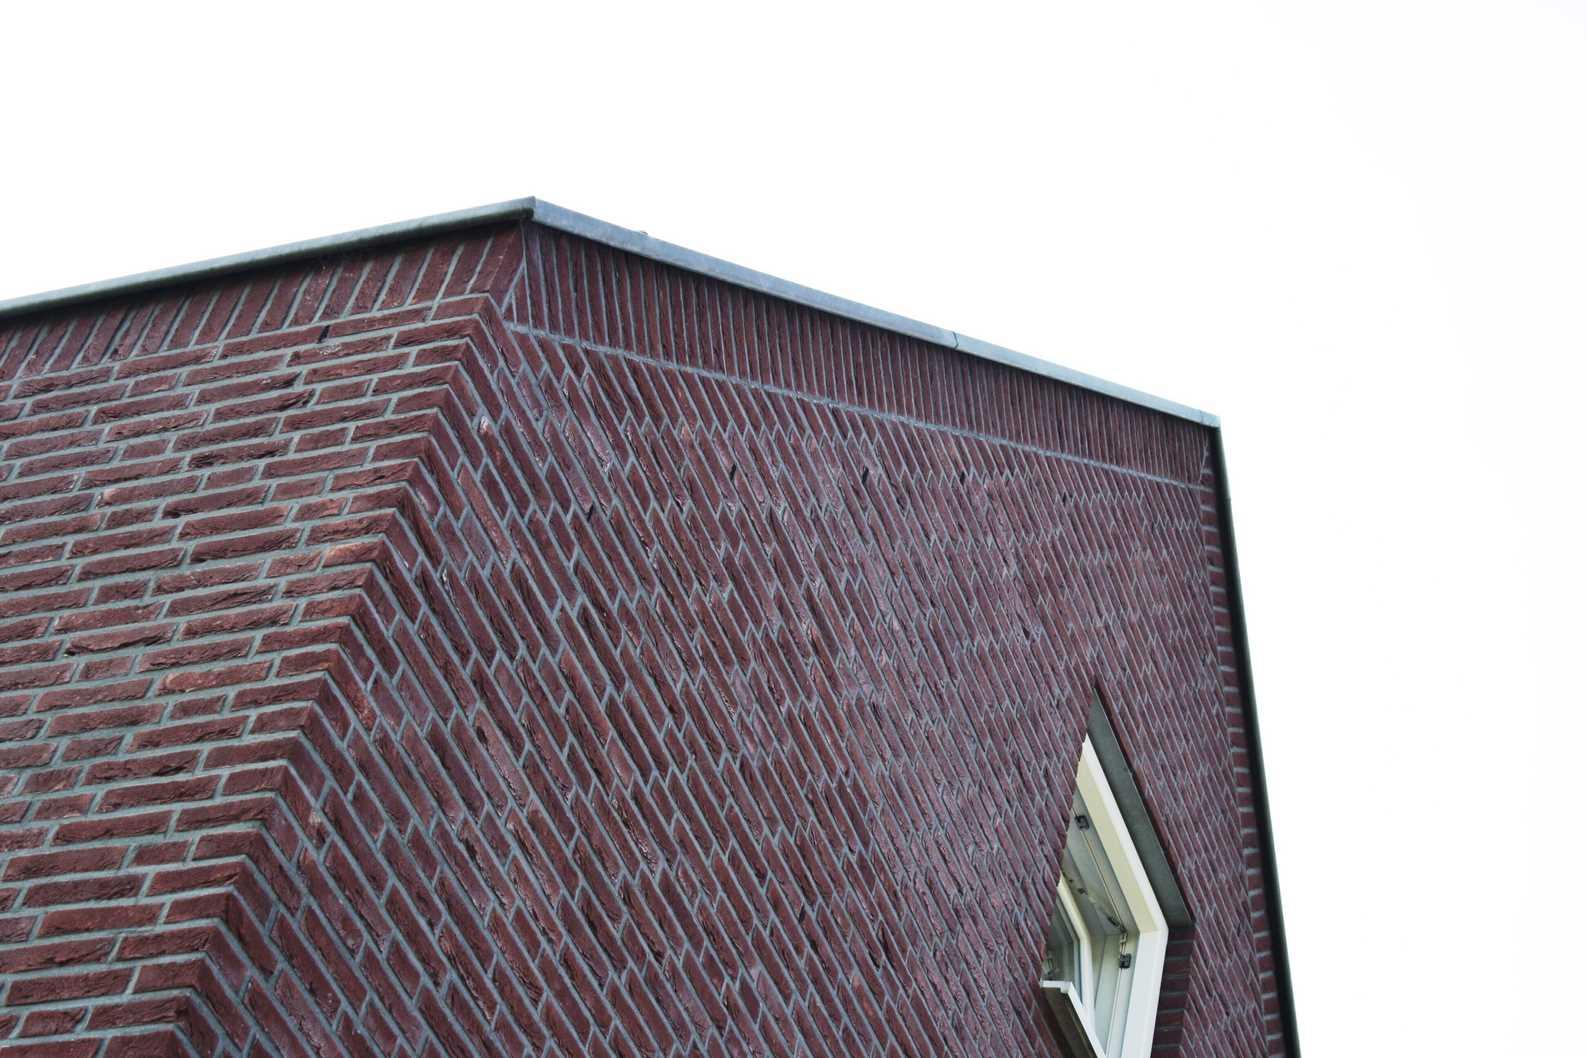 www.renescholtenarchitectuur.nl-project 07-f01 (Kopie)